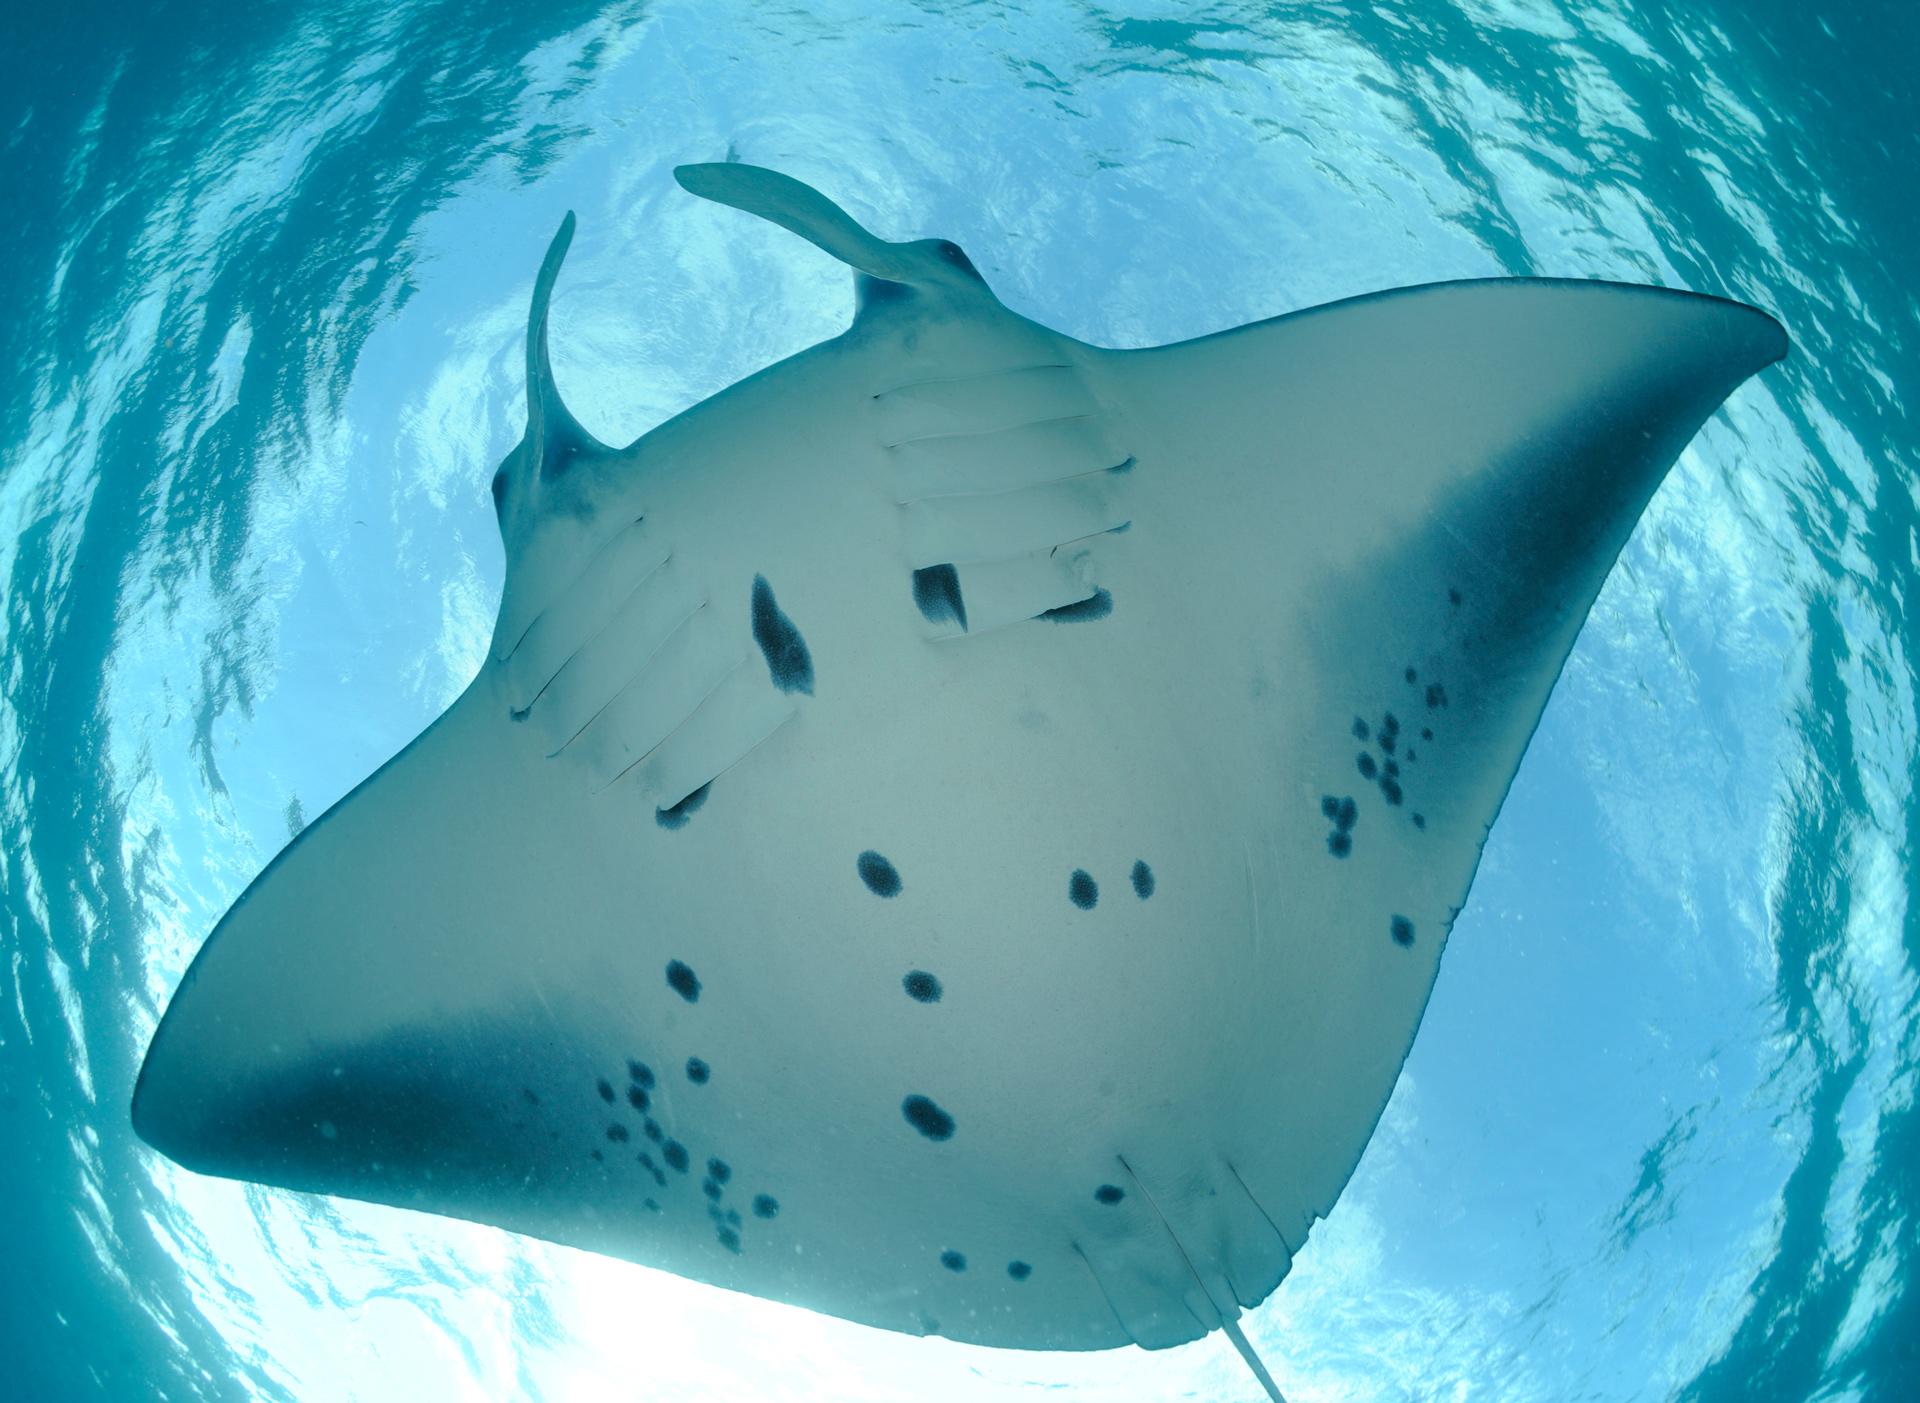 PEELlauren - spotting manta spots